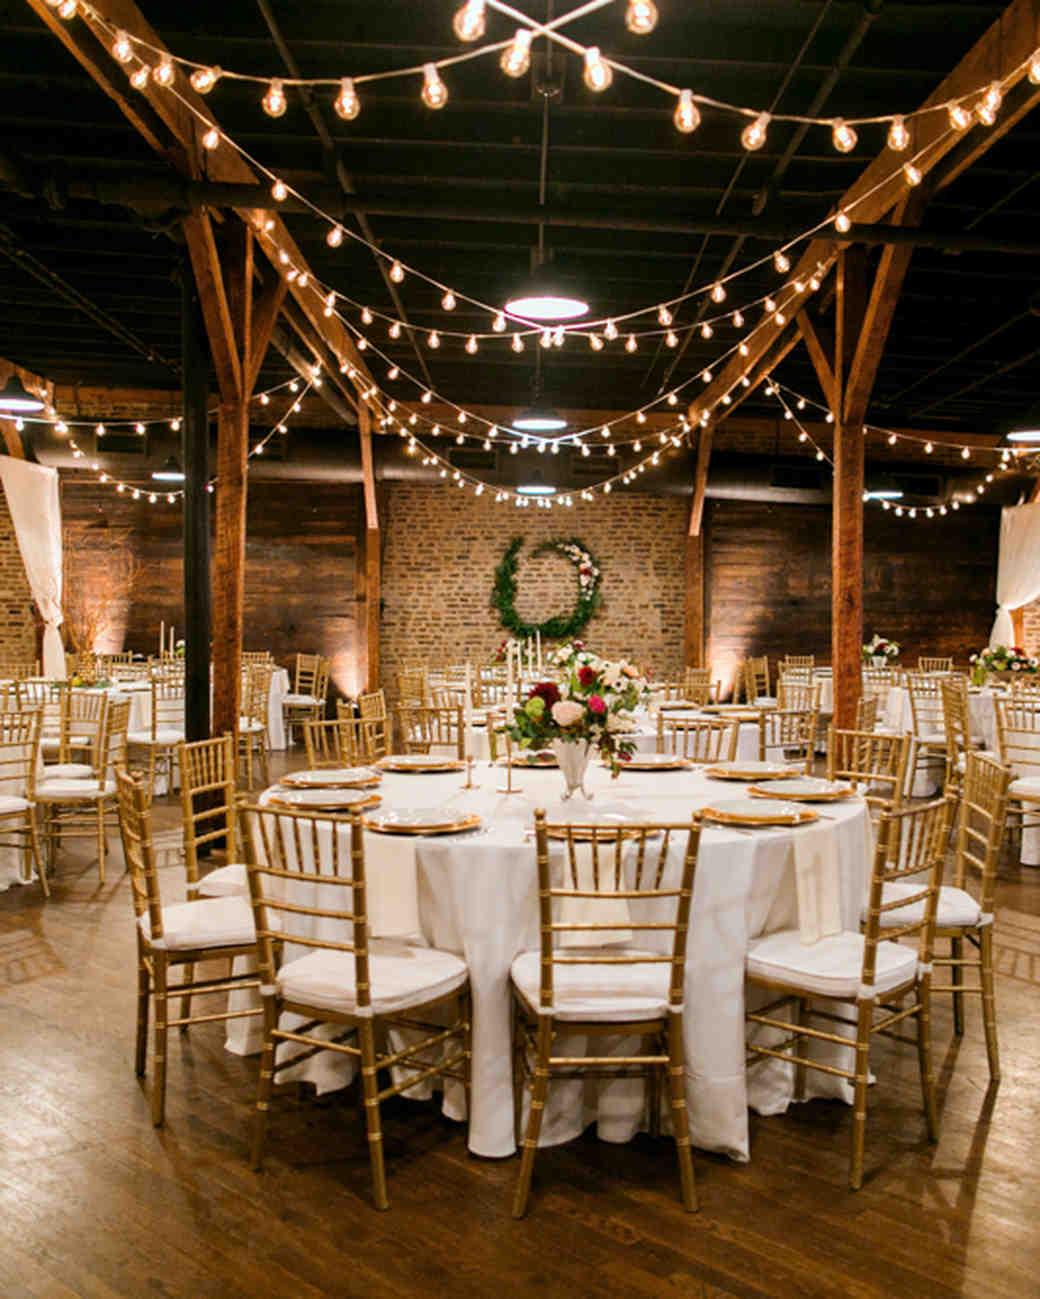 How to create an original design of halls for a wedding